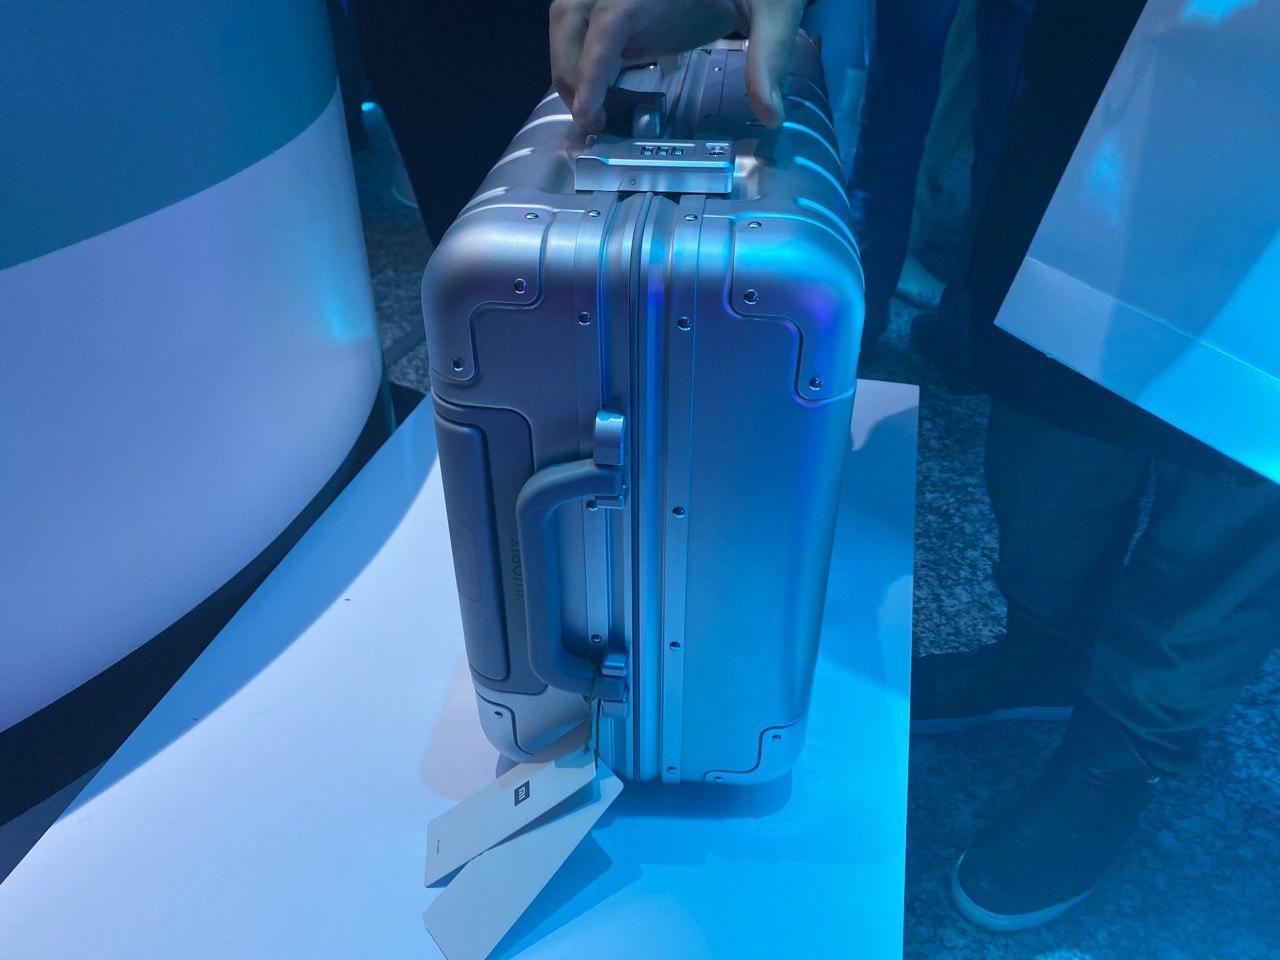 Компания Xiaomi представила чемодан, фен и аккумулятор (h5fntic4g0m)